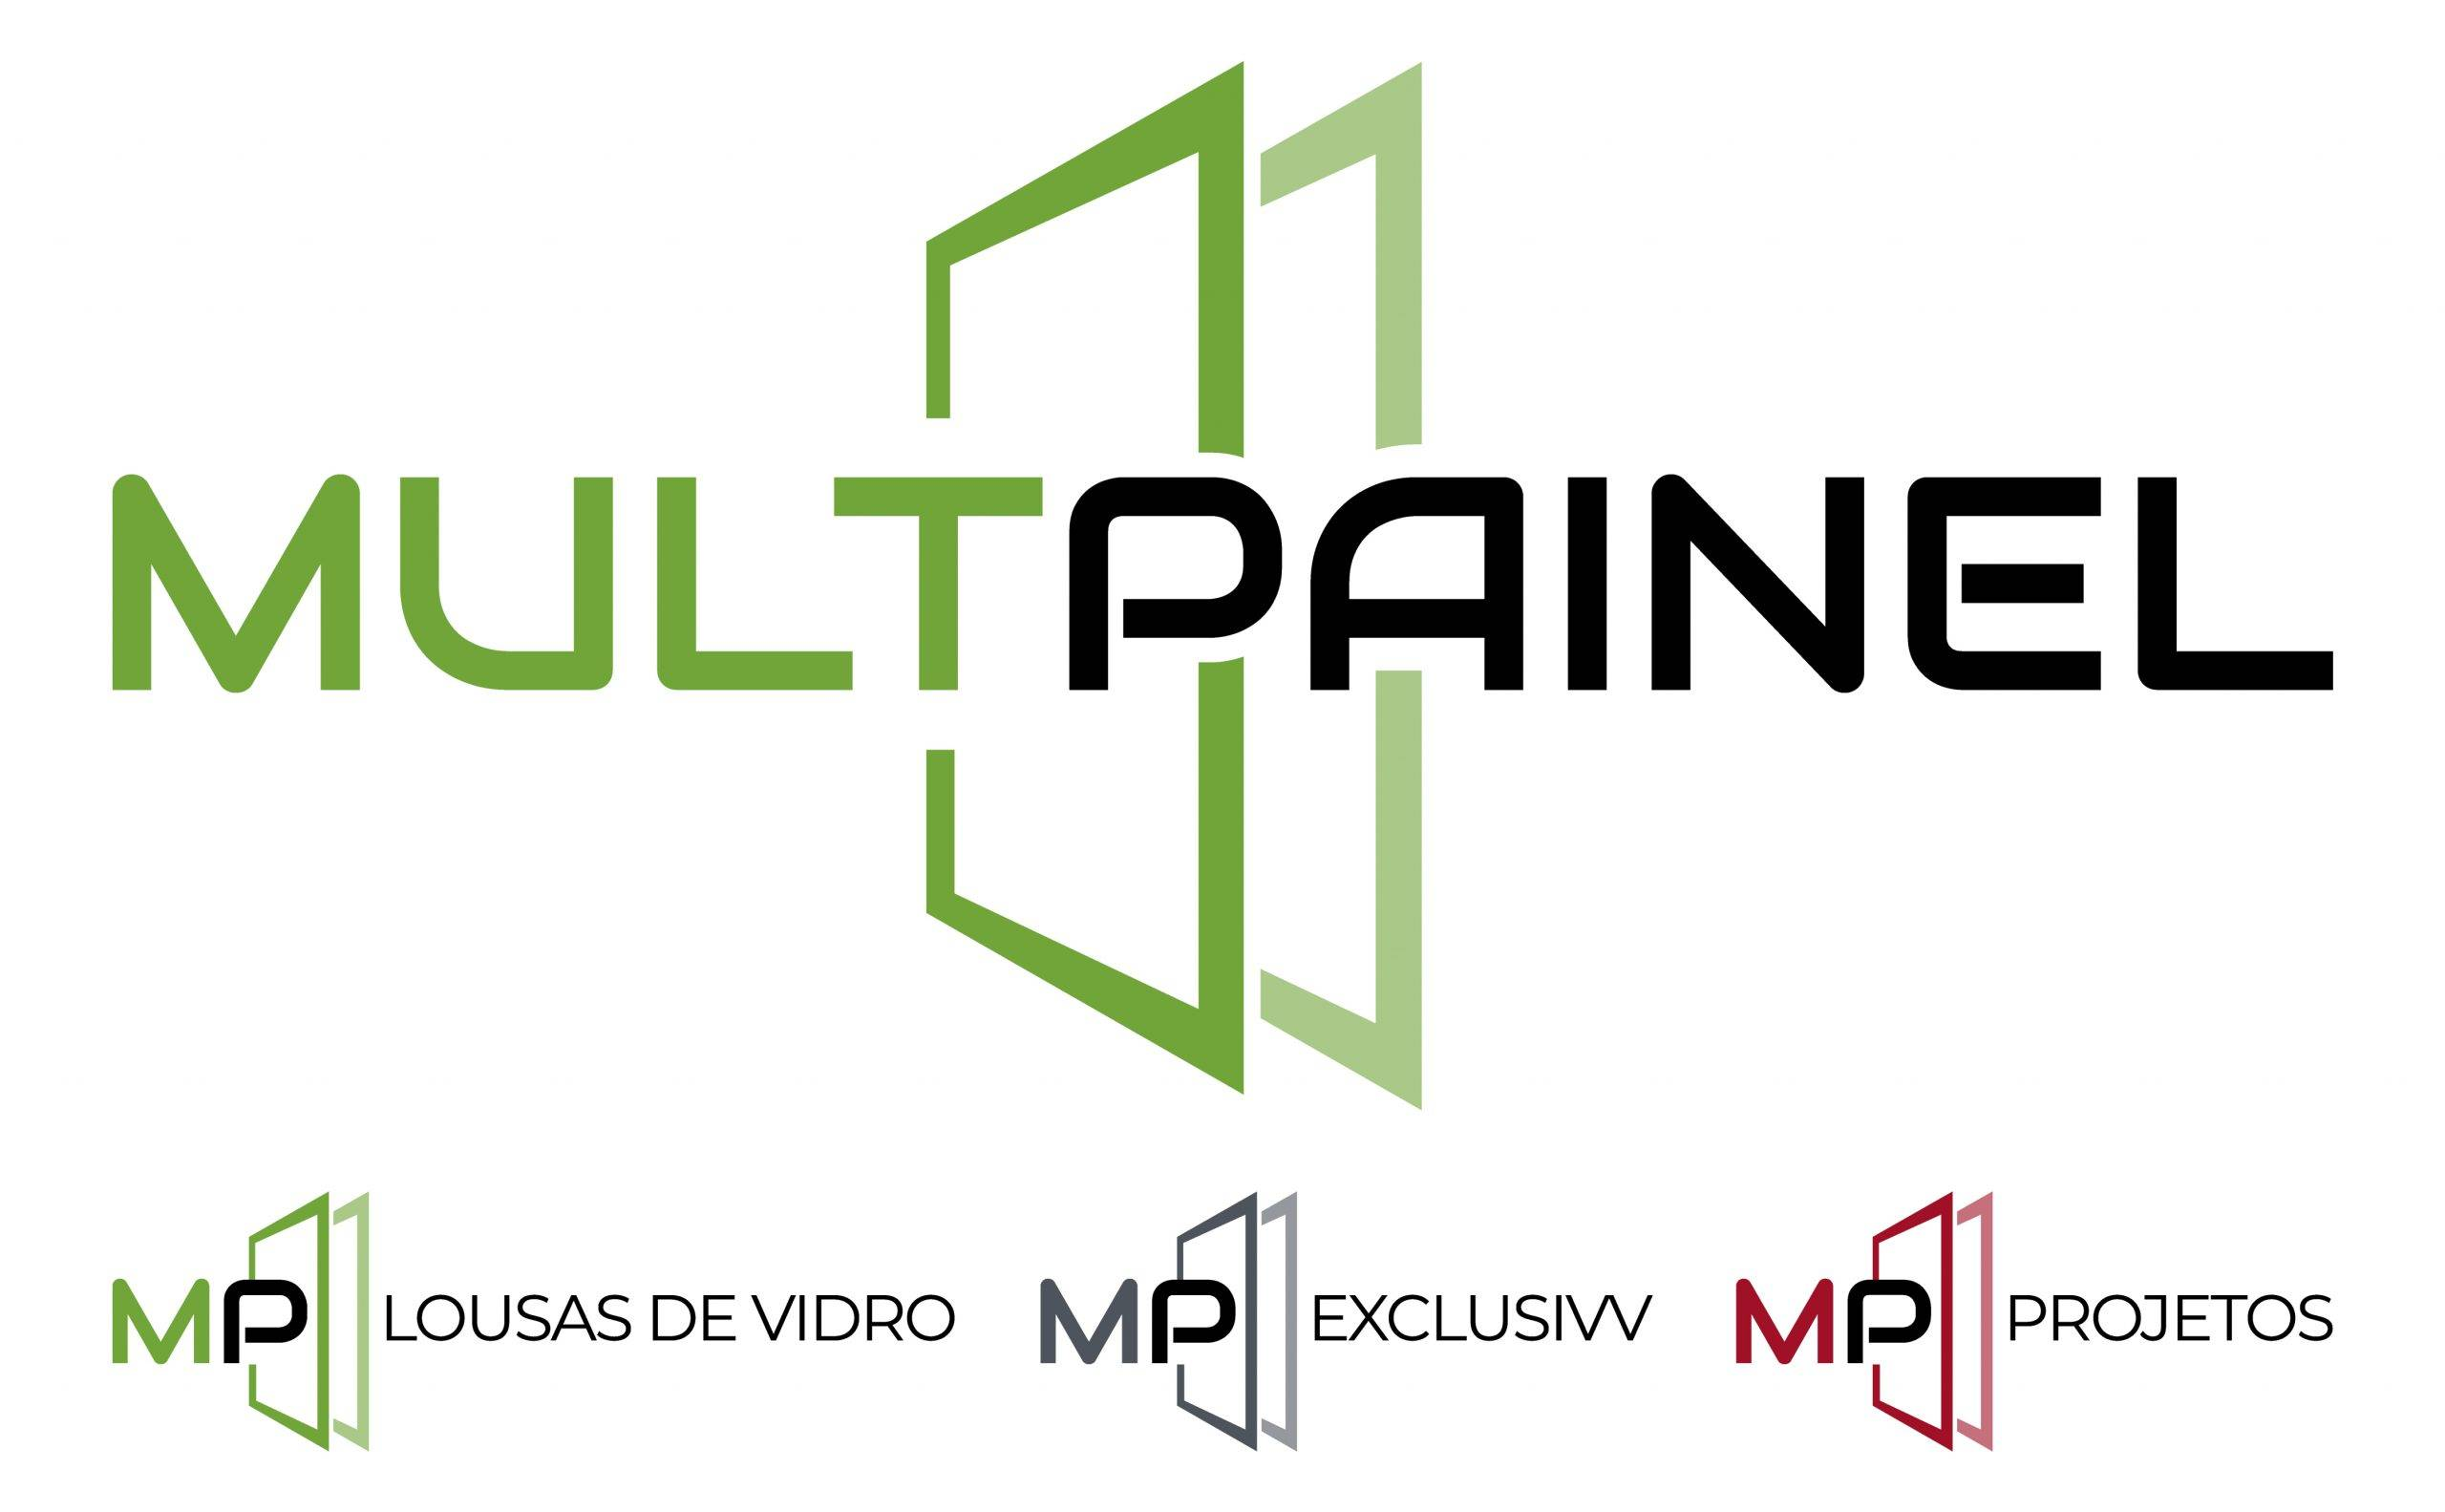 Nova identidade Multpainel